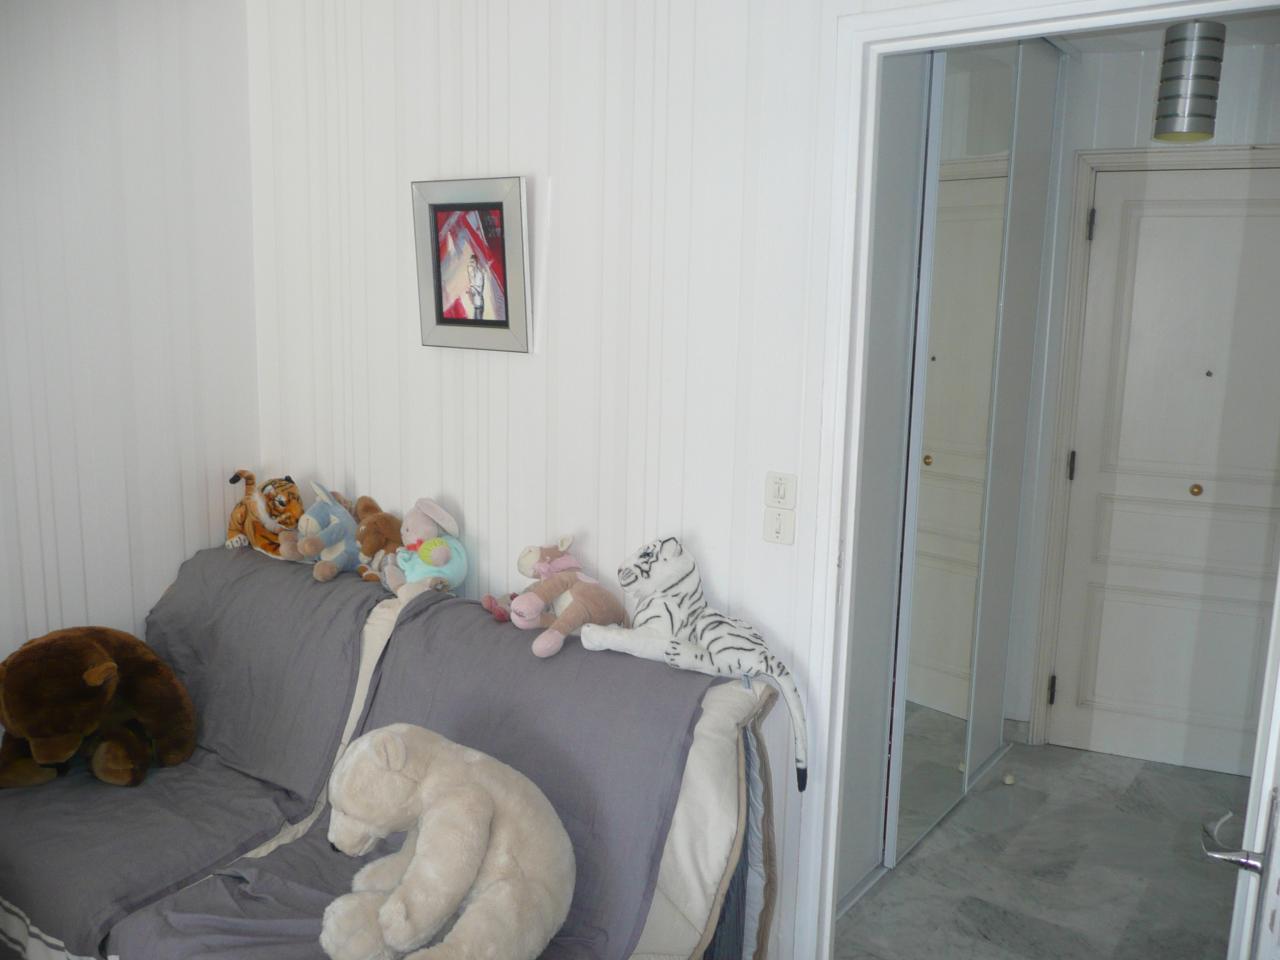 Loue studio climatis dans immeuble de standing centre ville d 39 antibes antibes vacances - Location studio meuble antibes ...